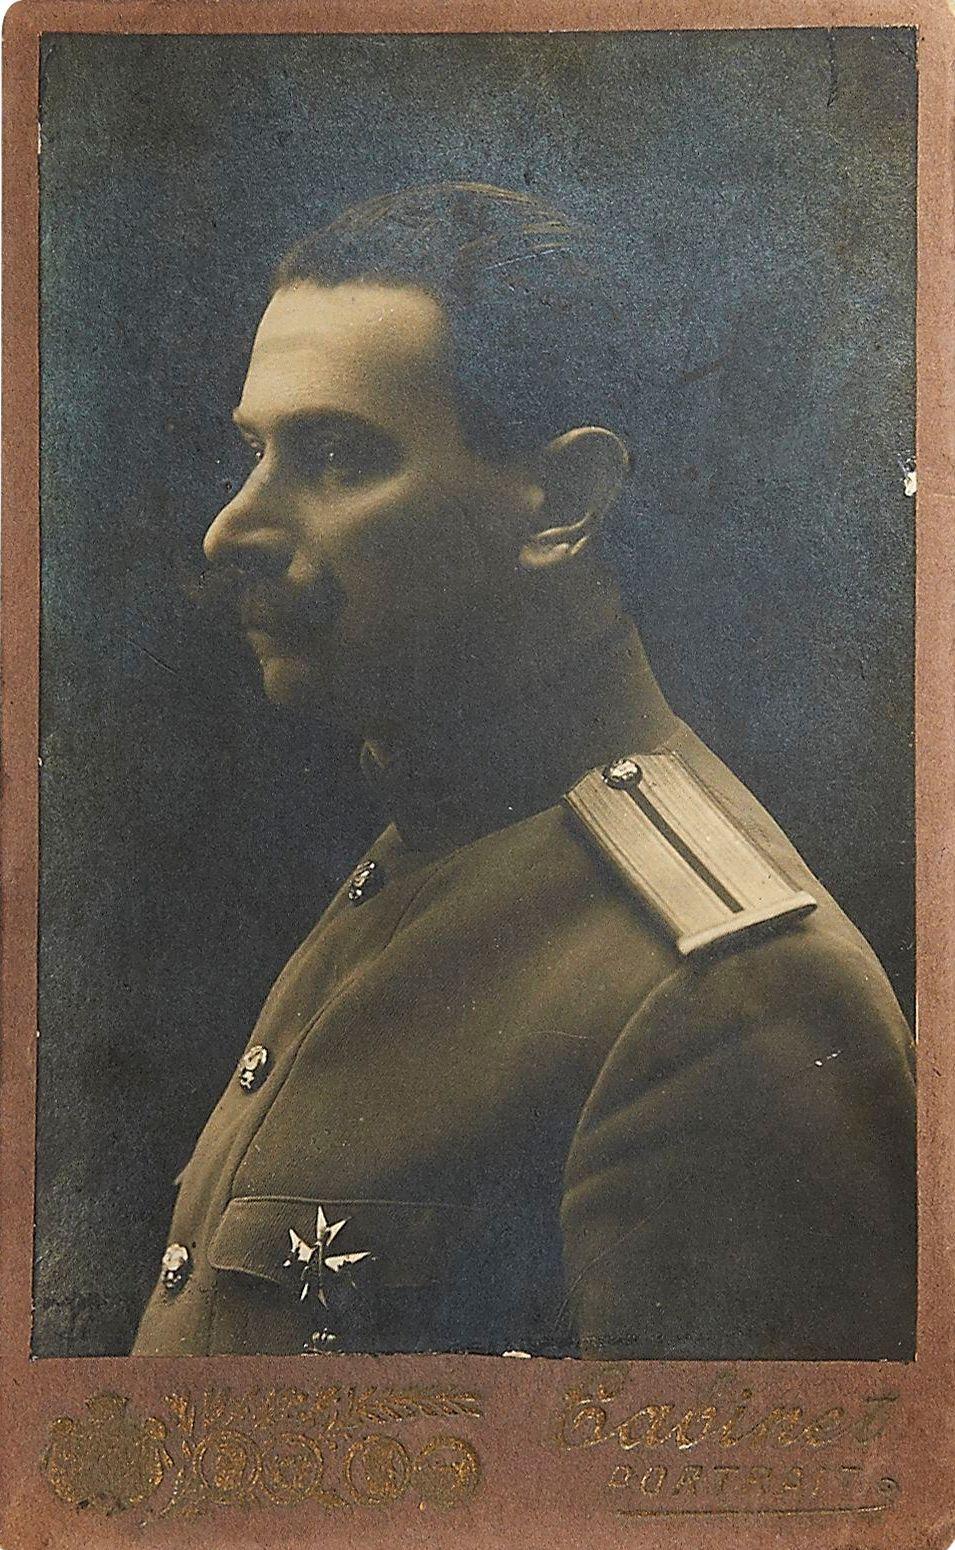 Фото капитана 145-го пехотного Новочеркасского Императора Александра III полка. 1915